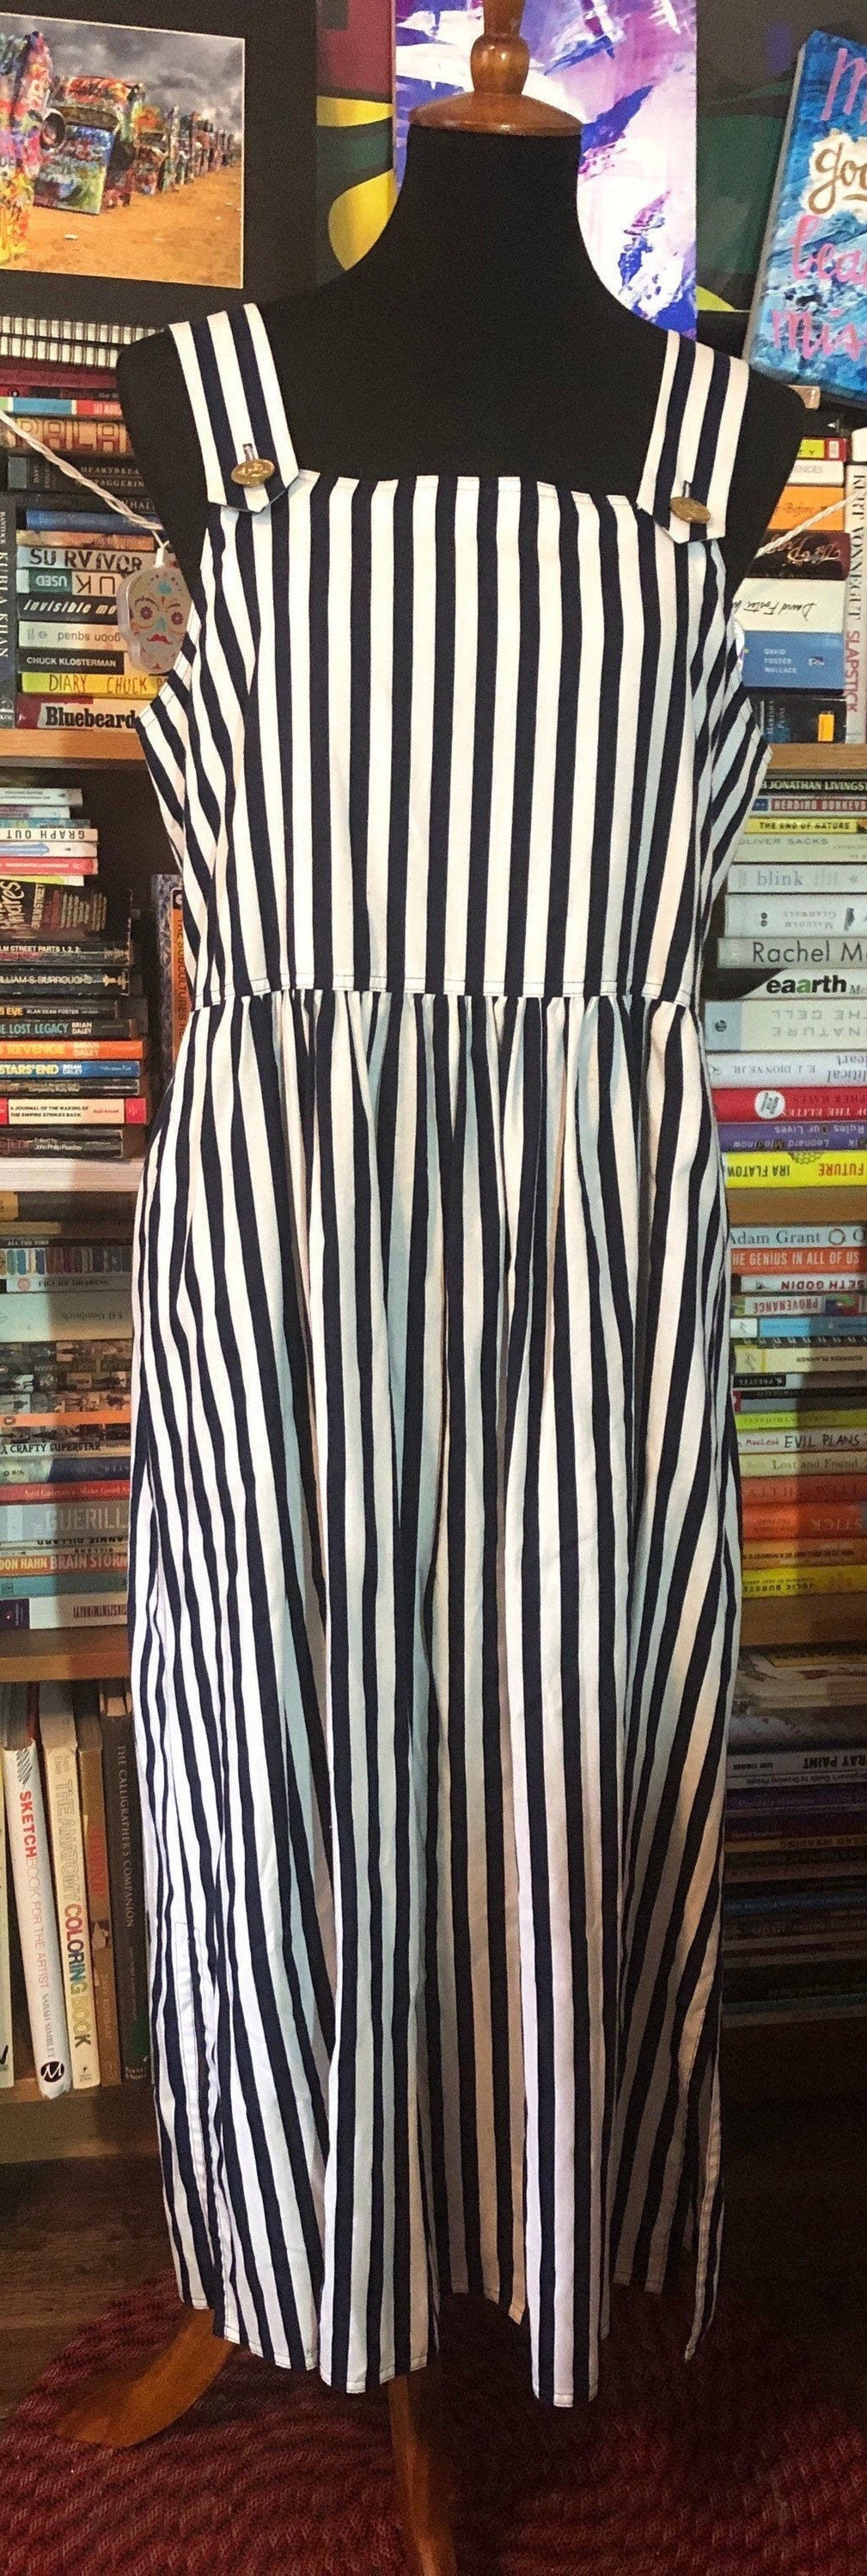 Vintage Aprons, Retro Aprons, Old Fashioned Aprons & Patterns 70s80s California Design By Dorothy Samuel Nautical Stripe Apron Dress $42.00 AT vintagedancer.com